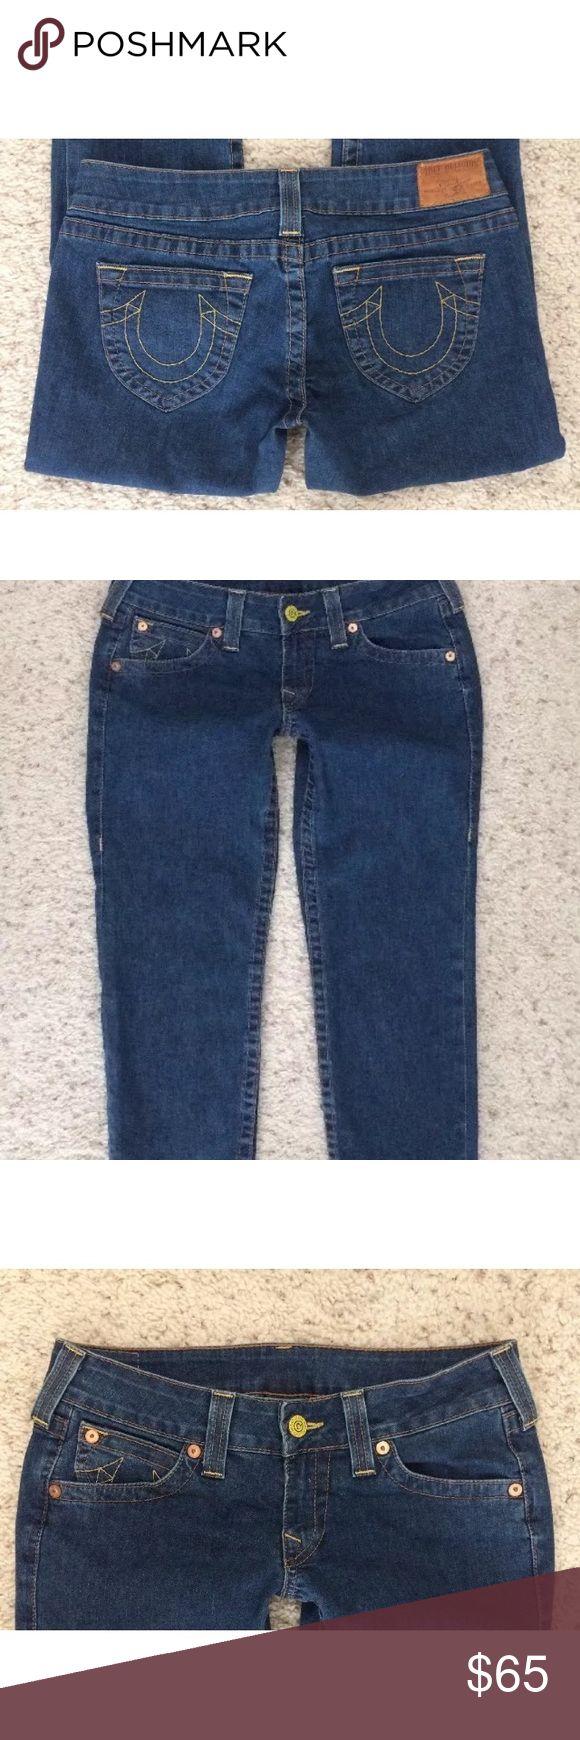 "True religion women's cropped jeans Sz 30 W 31"" Brand: True religion  Size: 30 Actual waist: 31"" Rise: 7"" Condition: great! True Religion Jeans Ankle & Cropped"